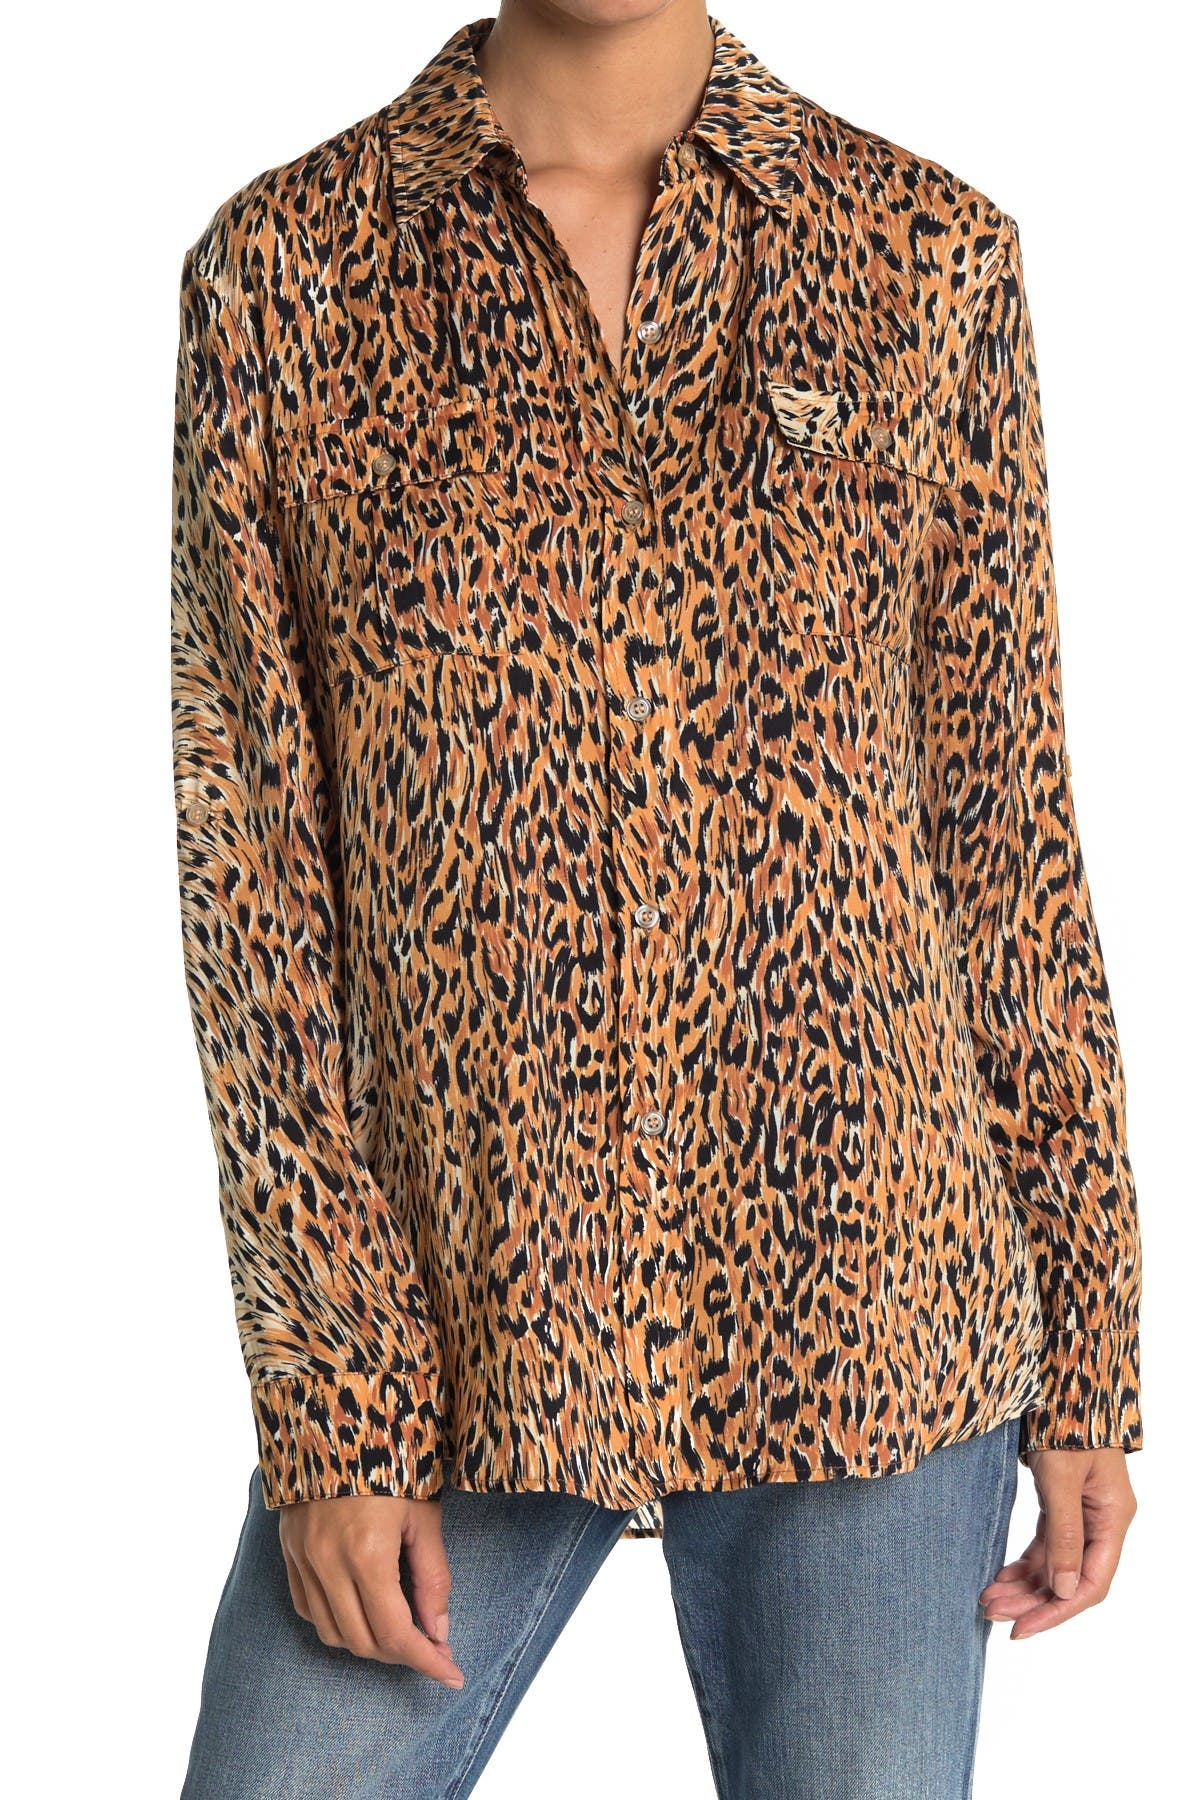 Image of LE SUPERBE Walking Safari Button Front Shirt